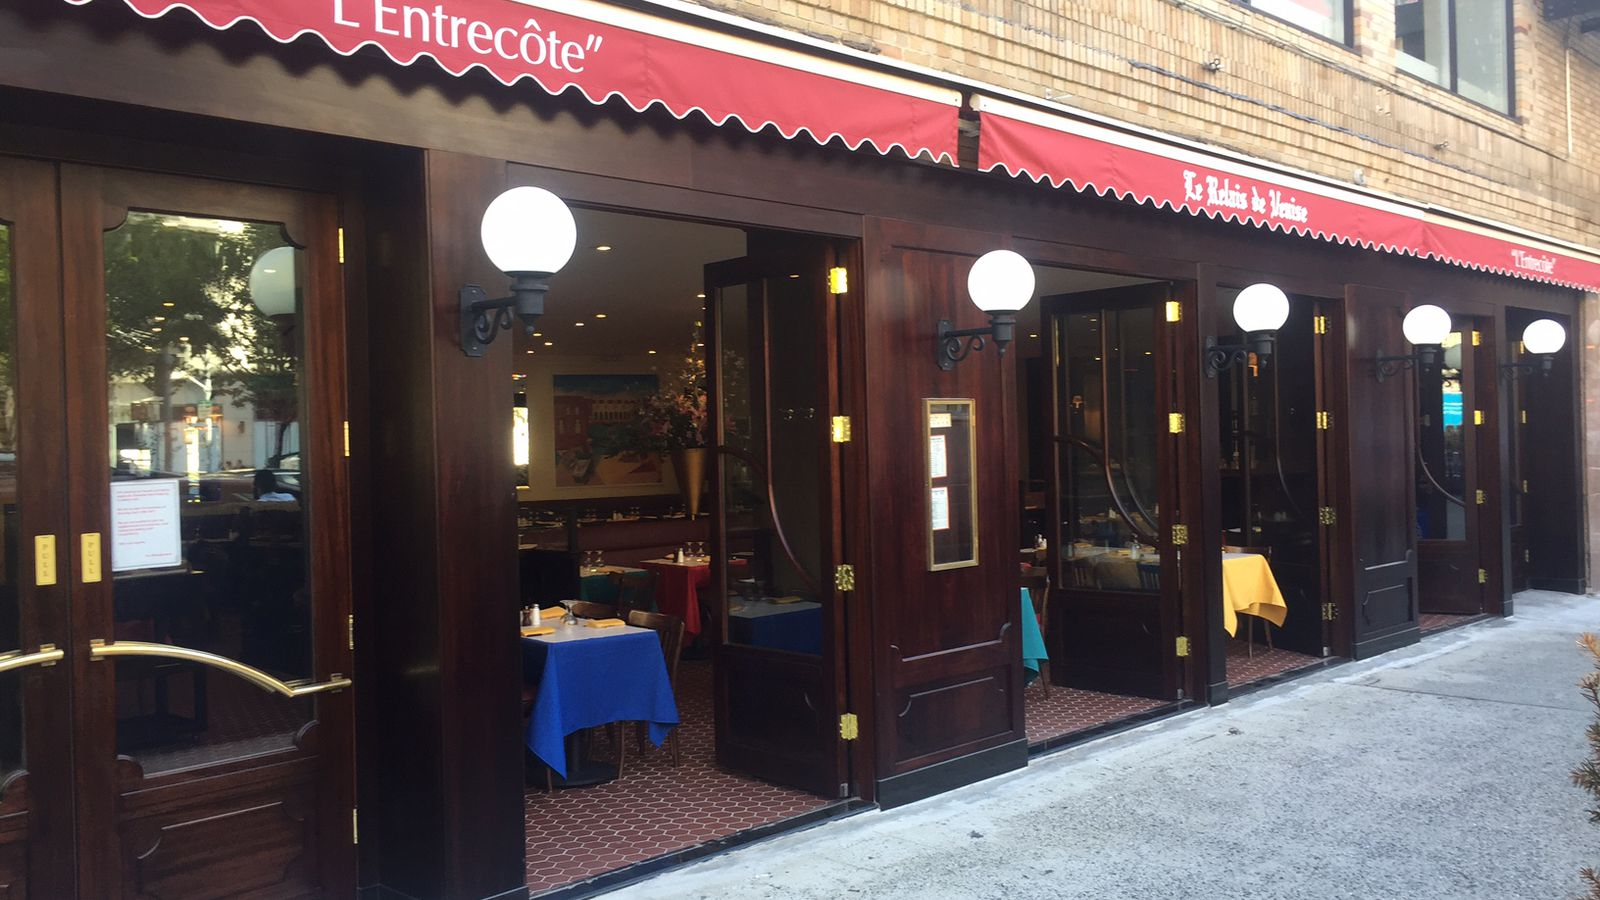 Entrecote Restaurant New York